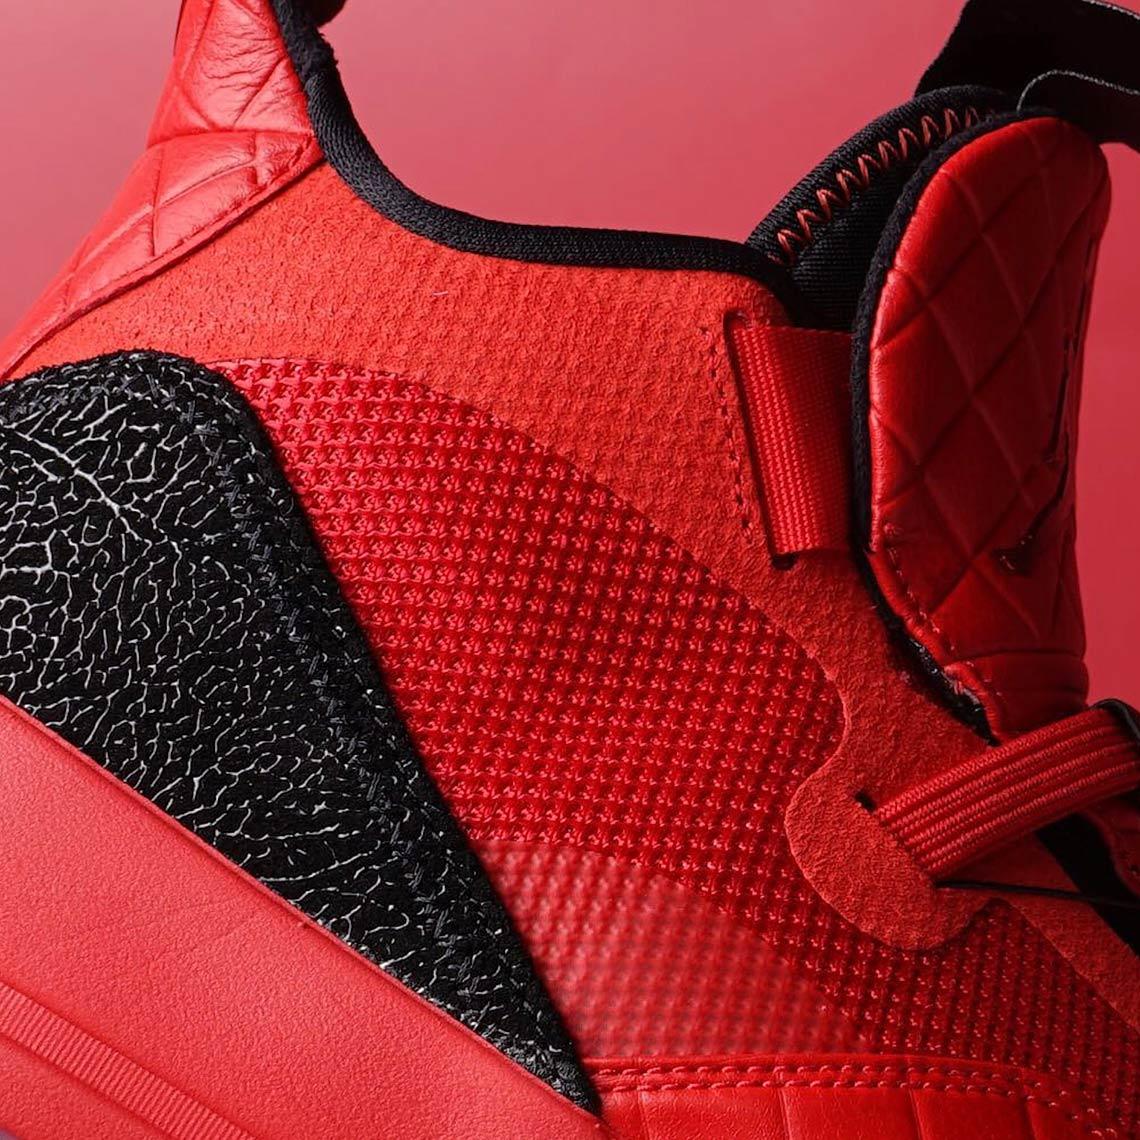 6ab8ef9b7 Jordan 33 Red AQ8830-600 Buying Guide + Info